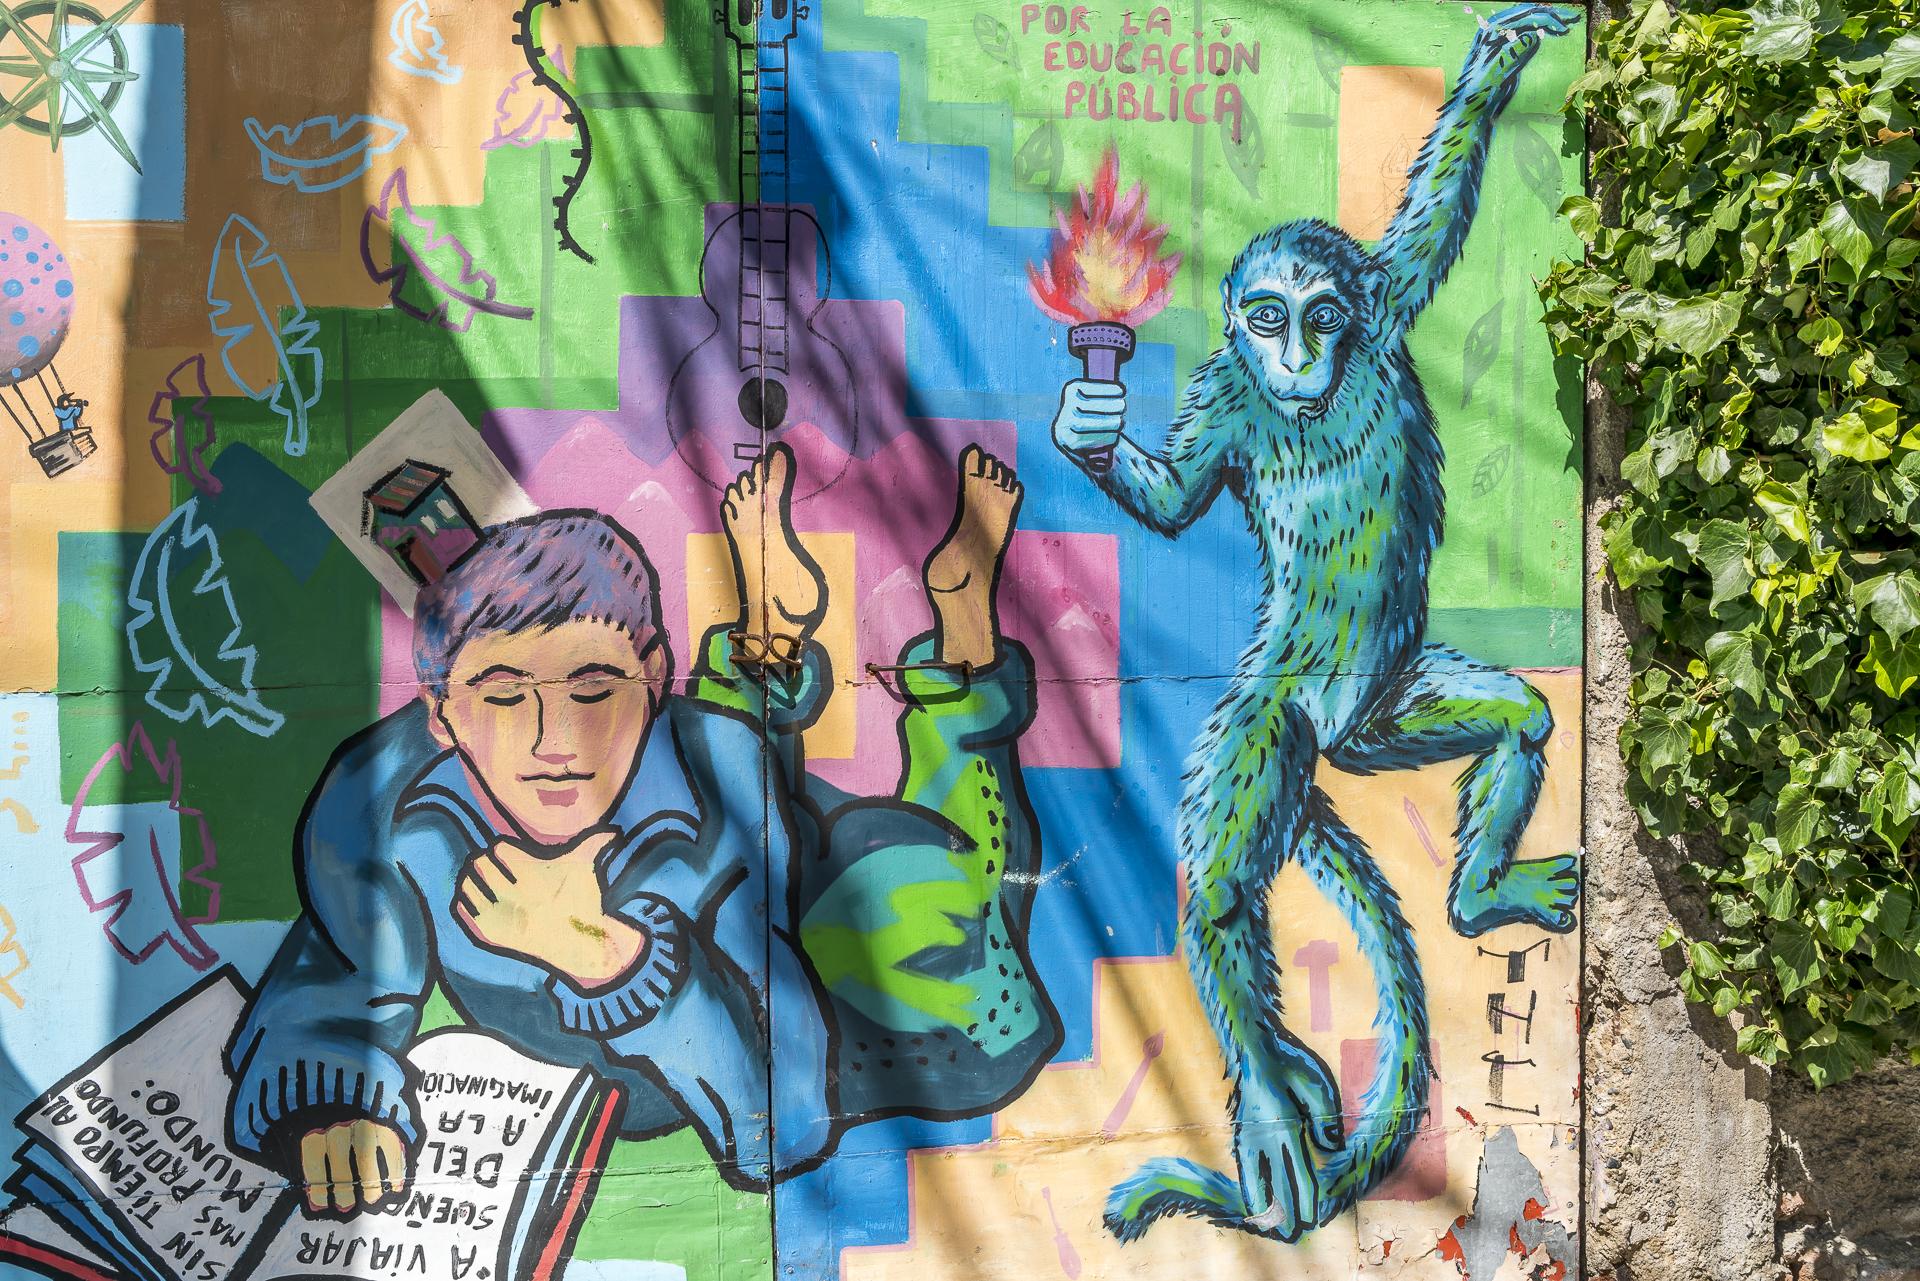 Street Art Valpo Chile